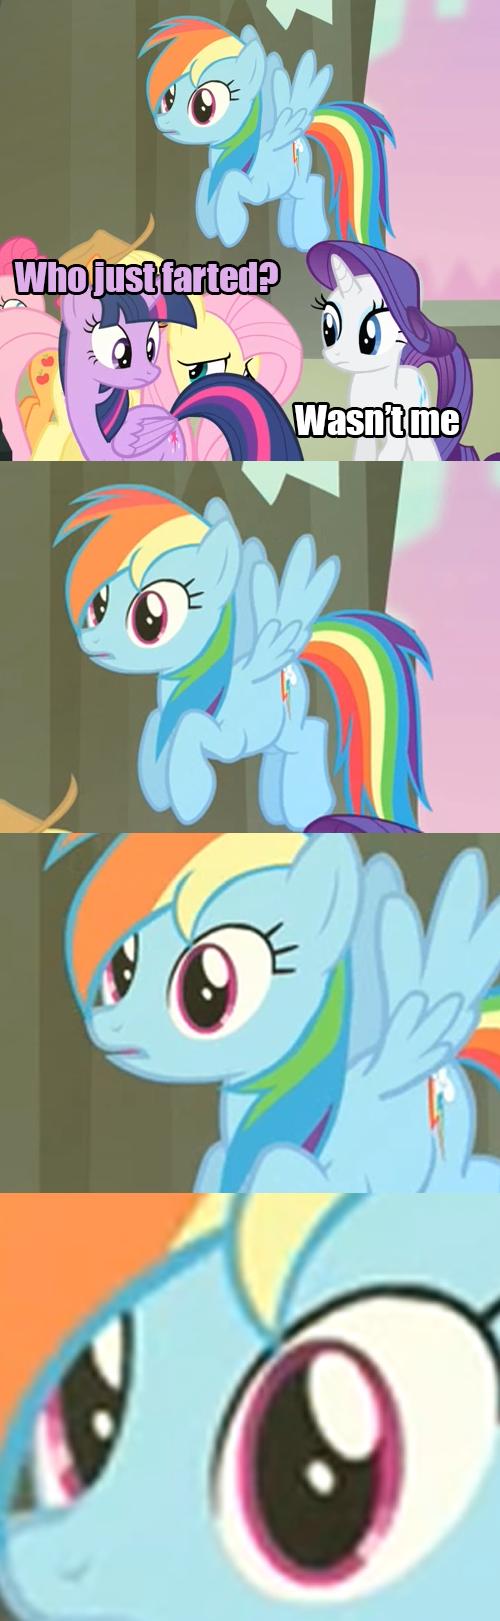 farts,dat face,MLP,rainbow dash